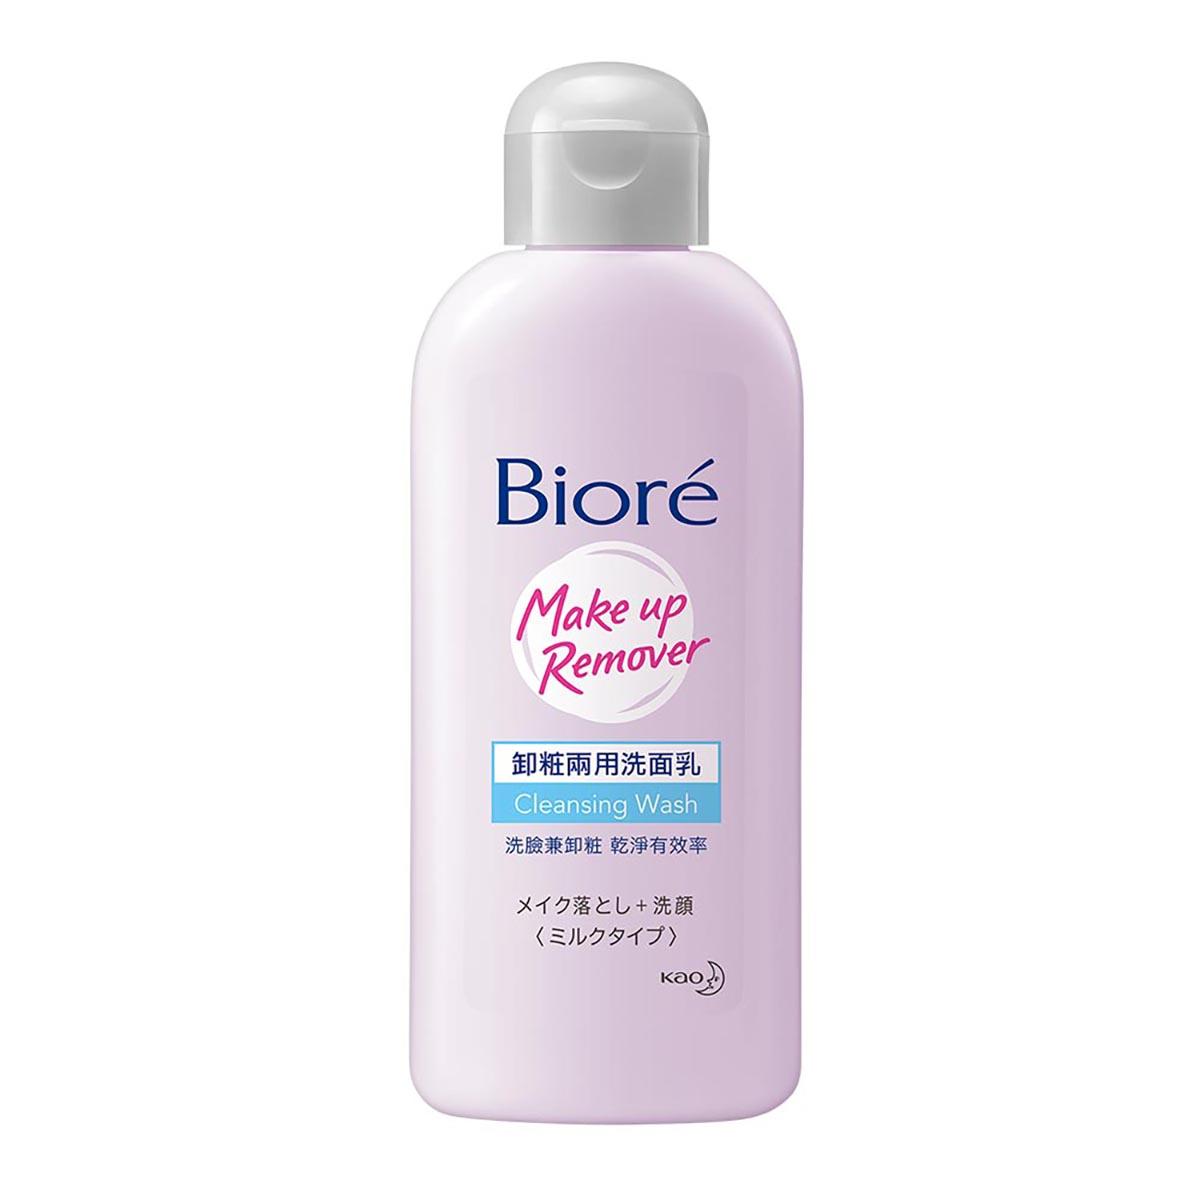 Biore蜜妮 卸粧兩用洗面乳120ml【康是美】